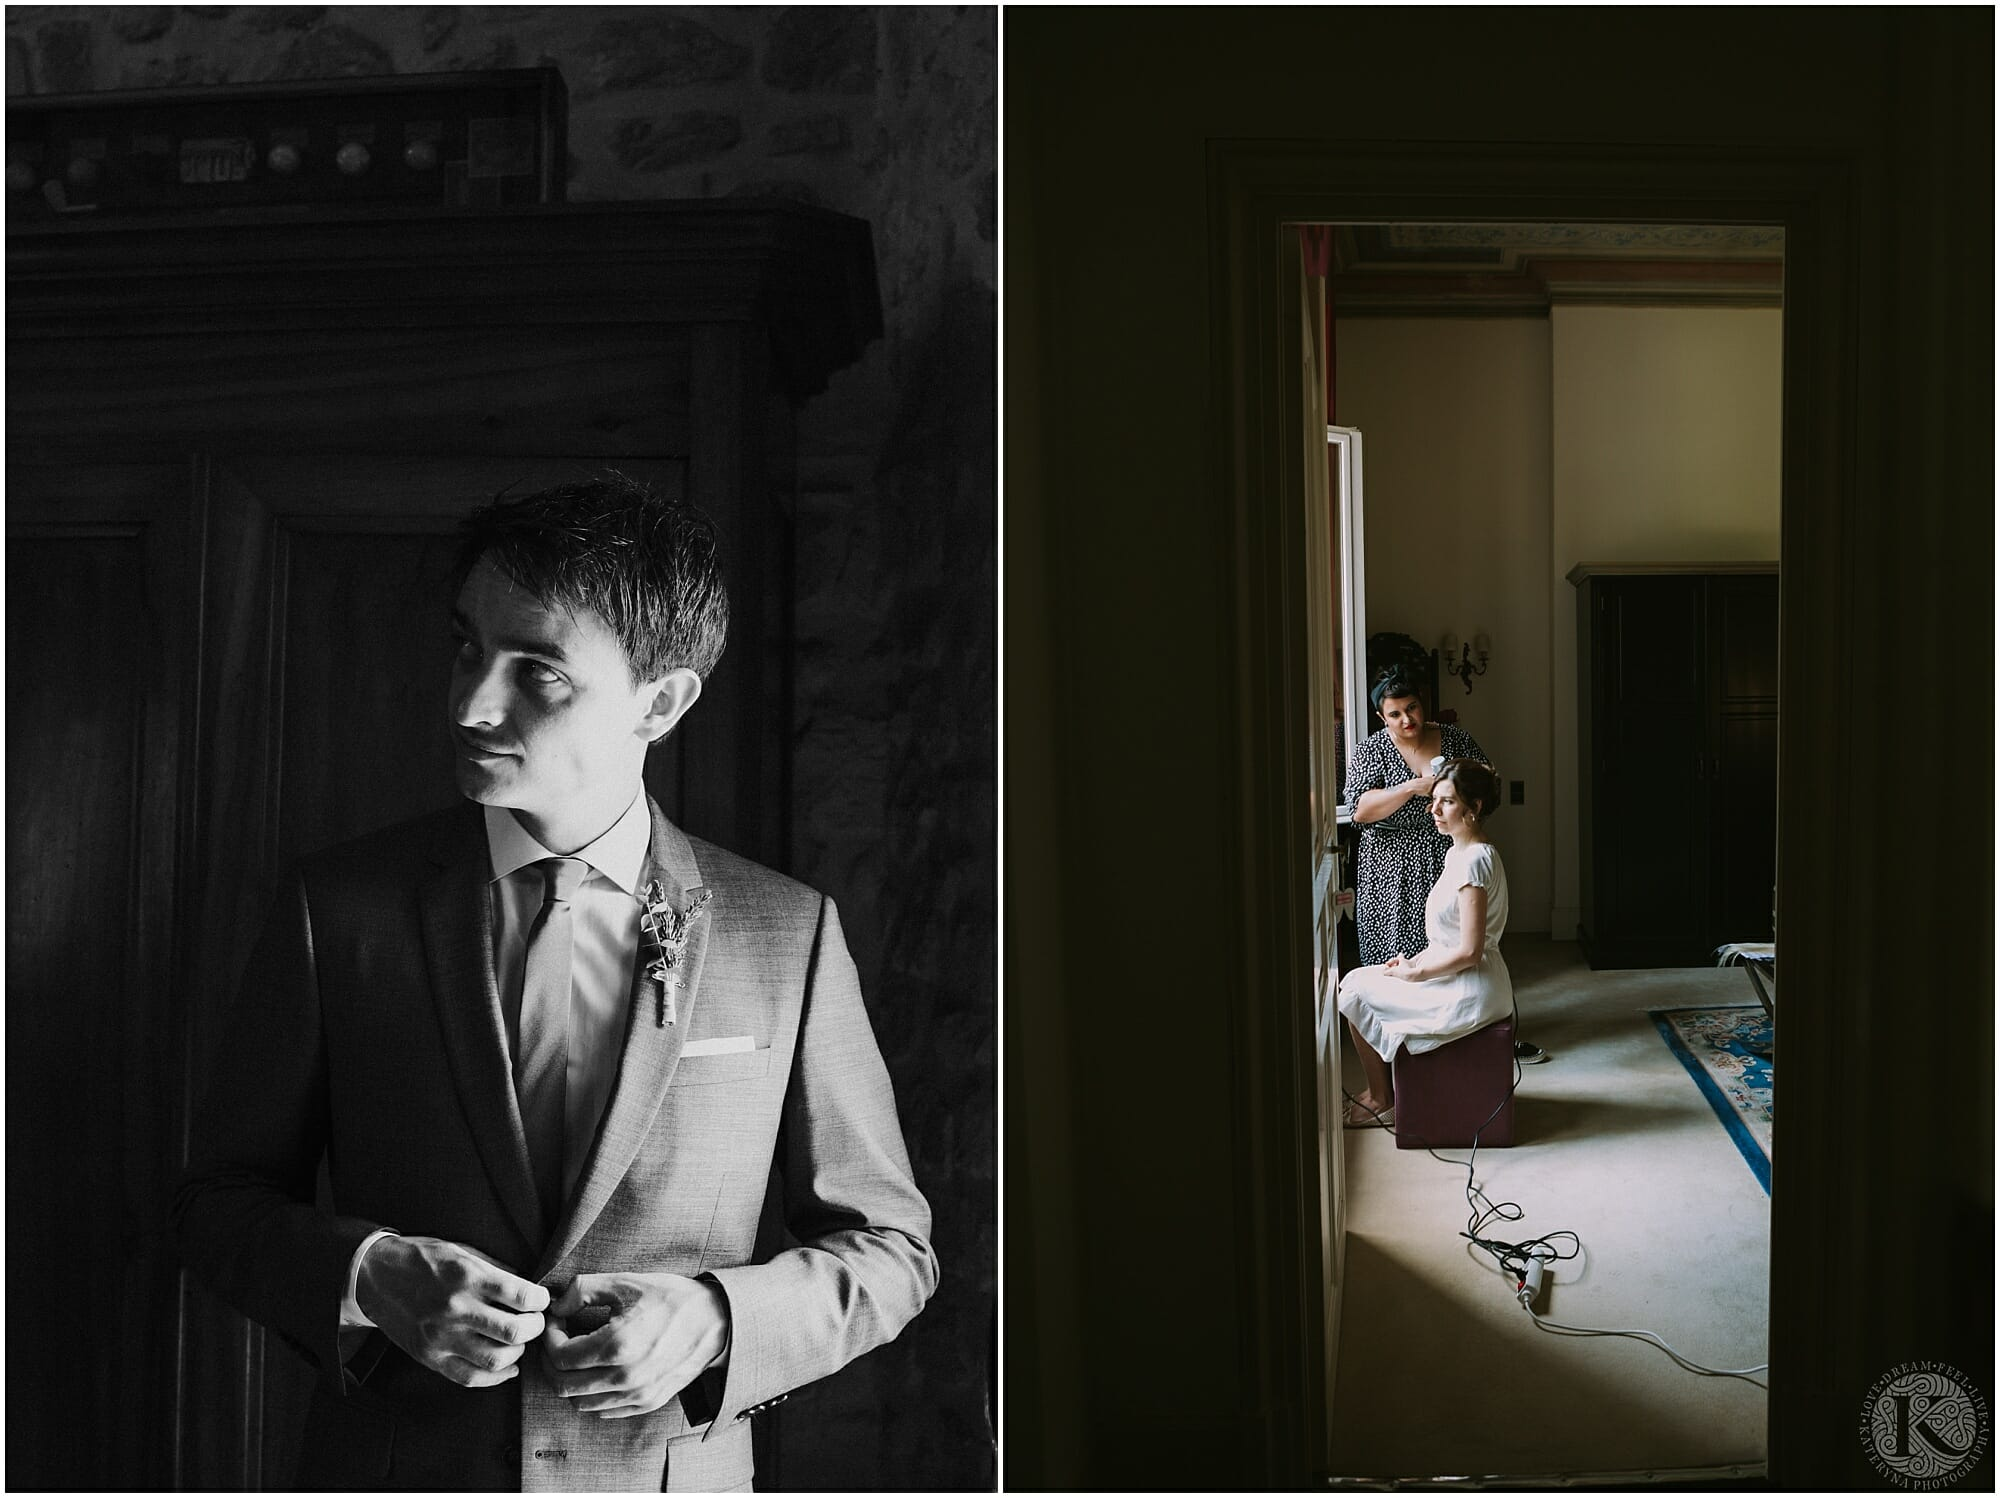 Kateryna-photos-photographe-mariage-chateau-des-3-fontaines-provence-avignon-vaucluse-sud_0012.jpg